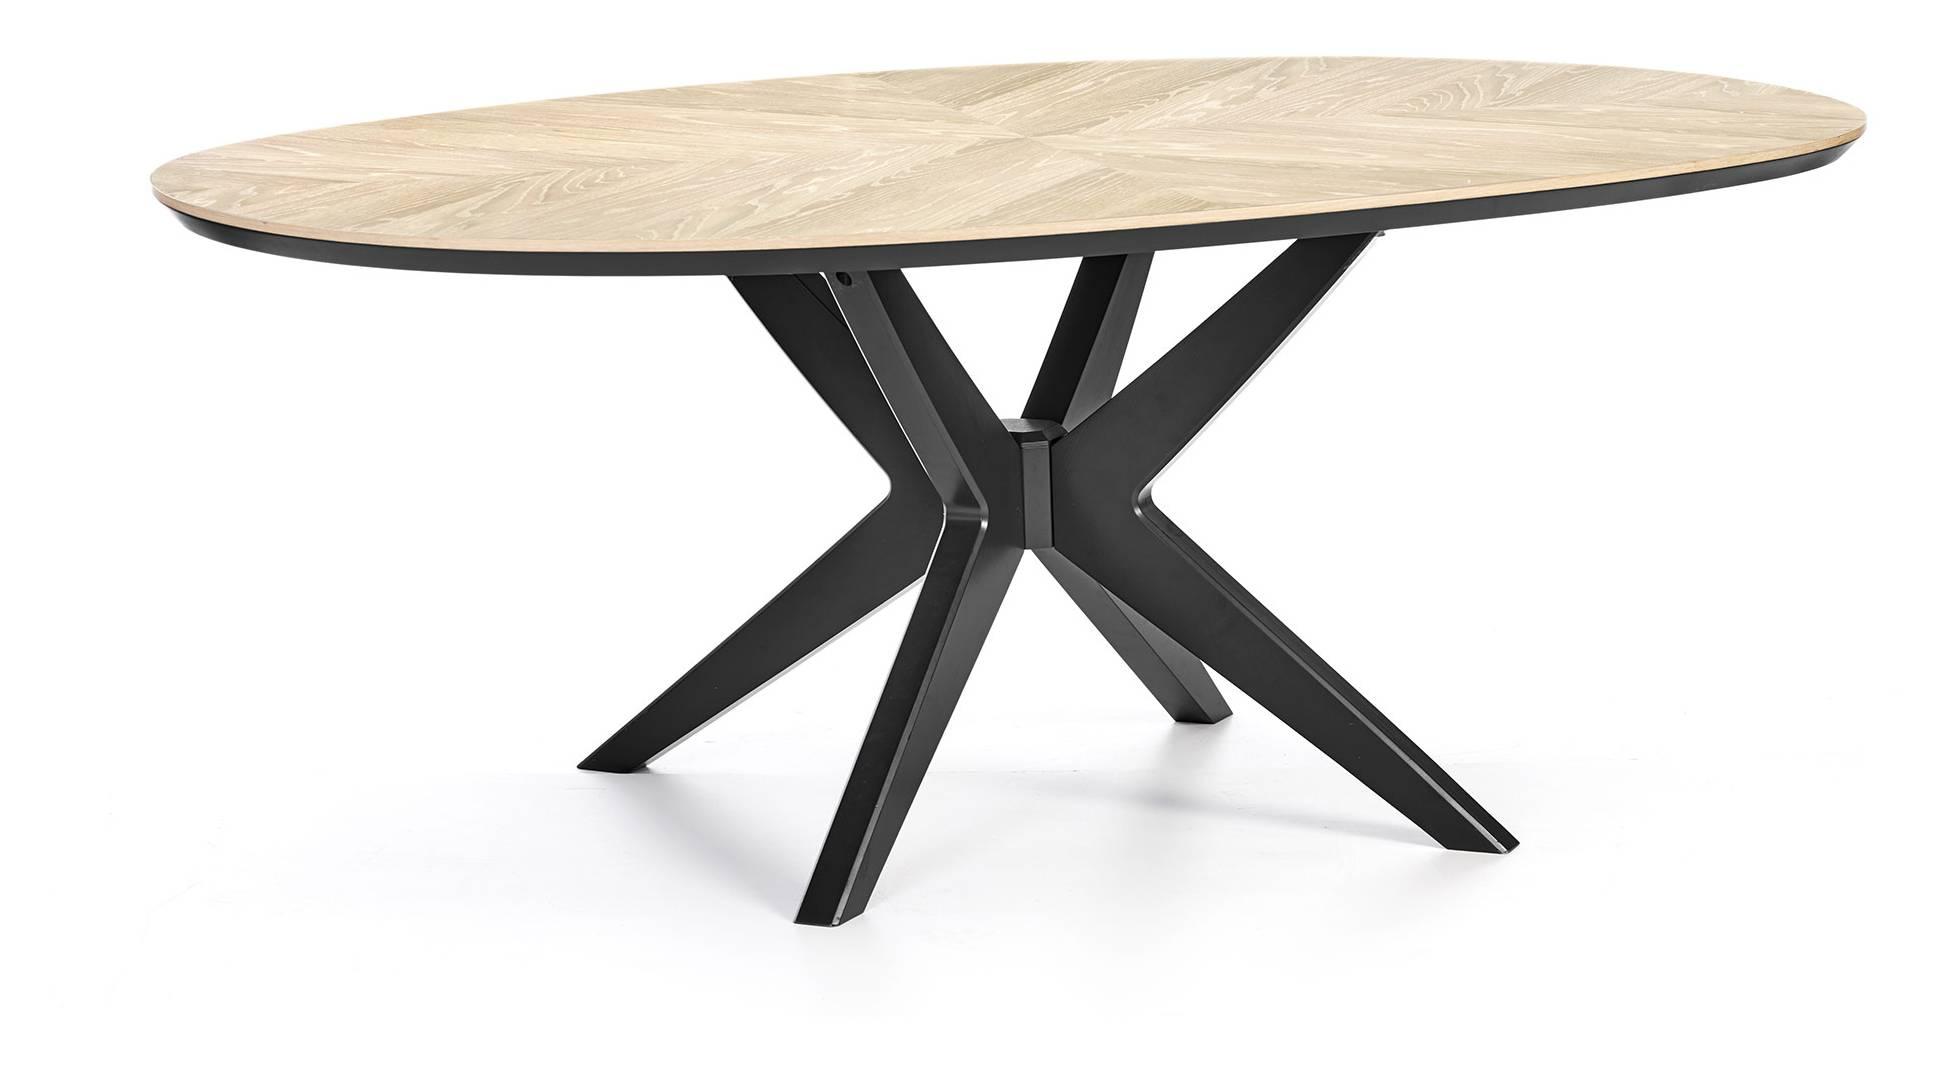 Quebec Elliptical Dining Table